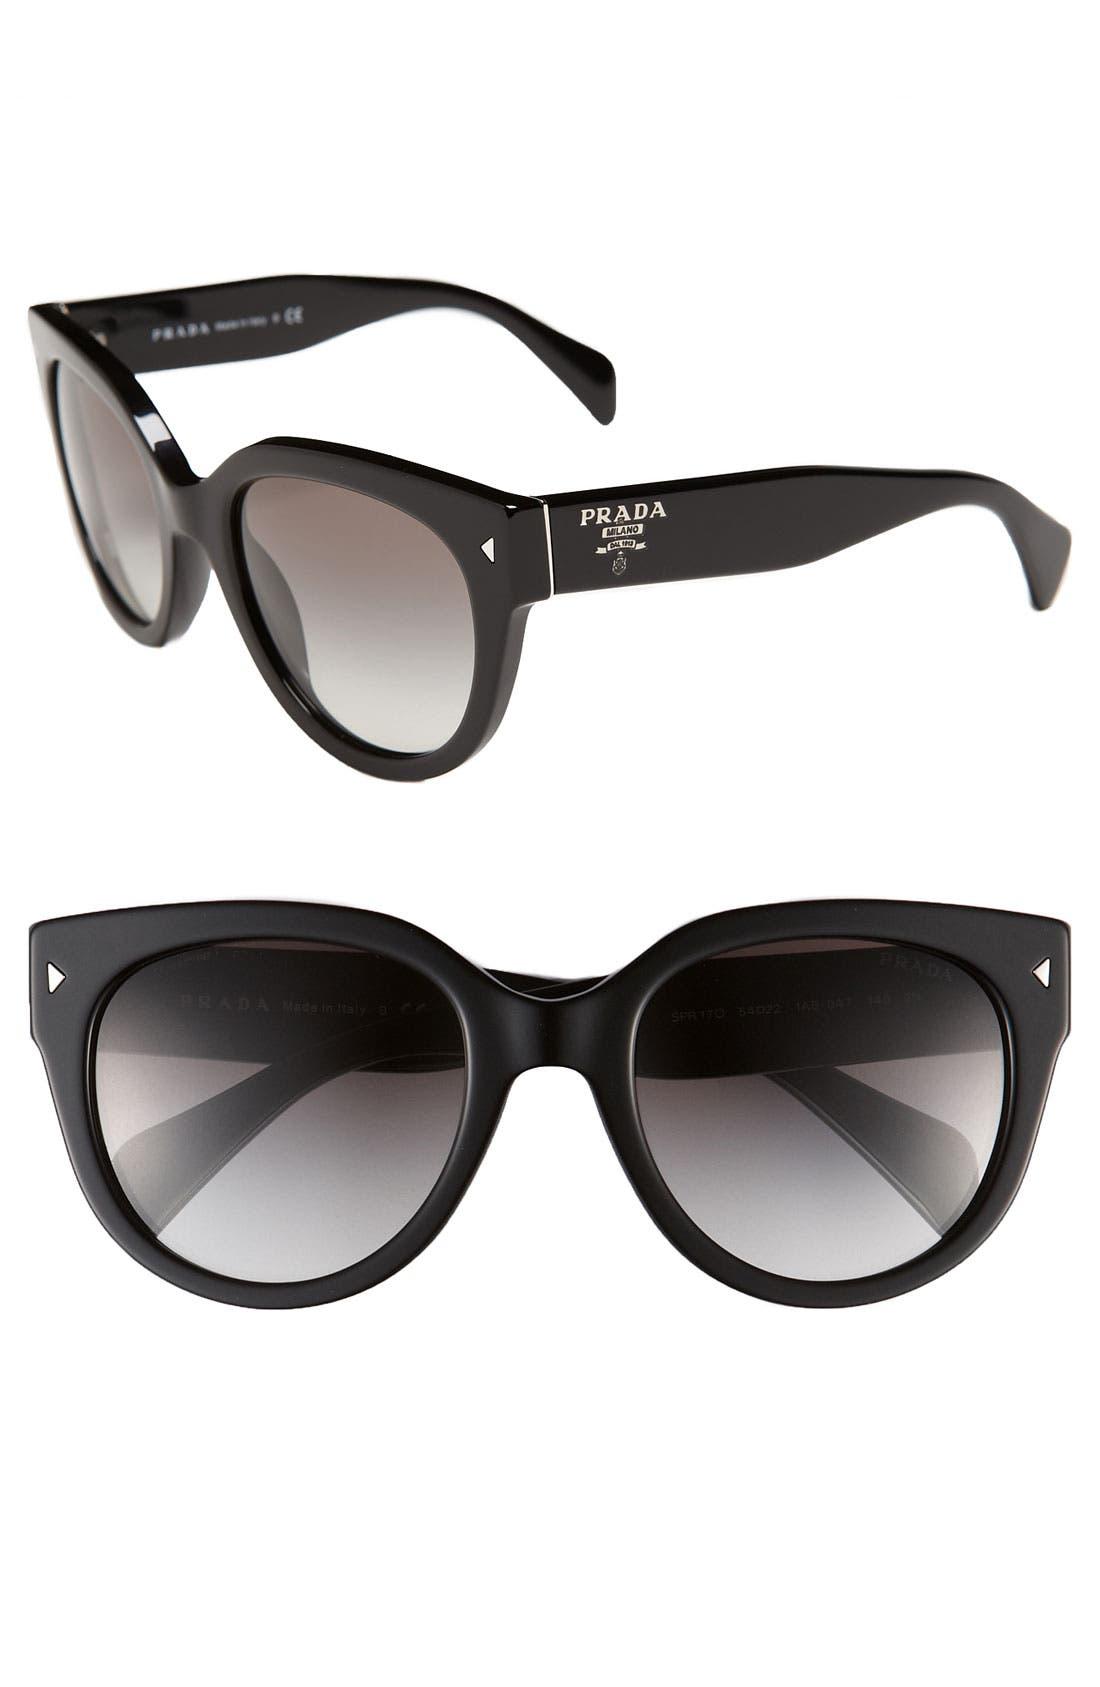 Main Image - Prada 54mm Cat Eye Sunglasses